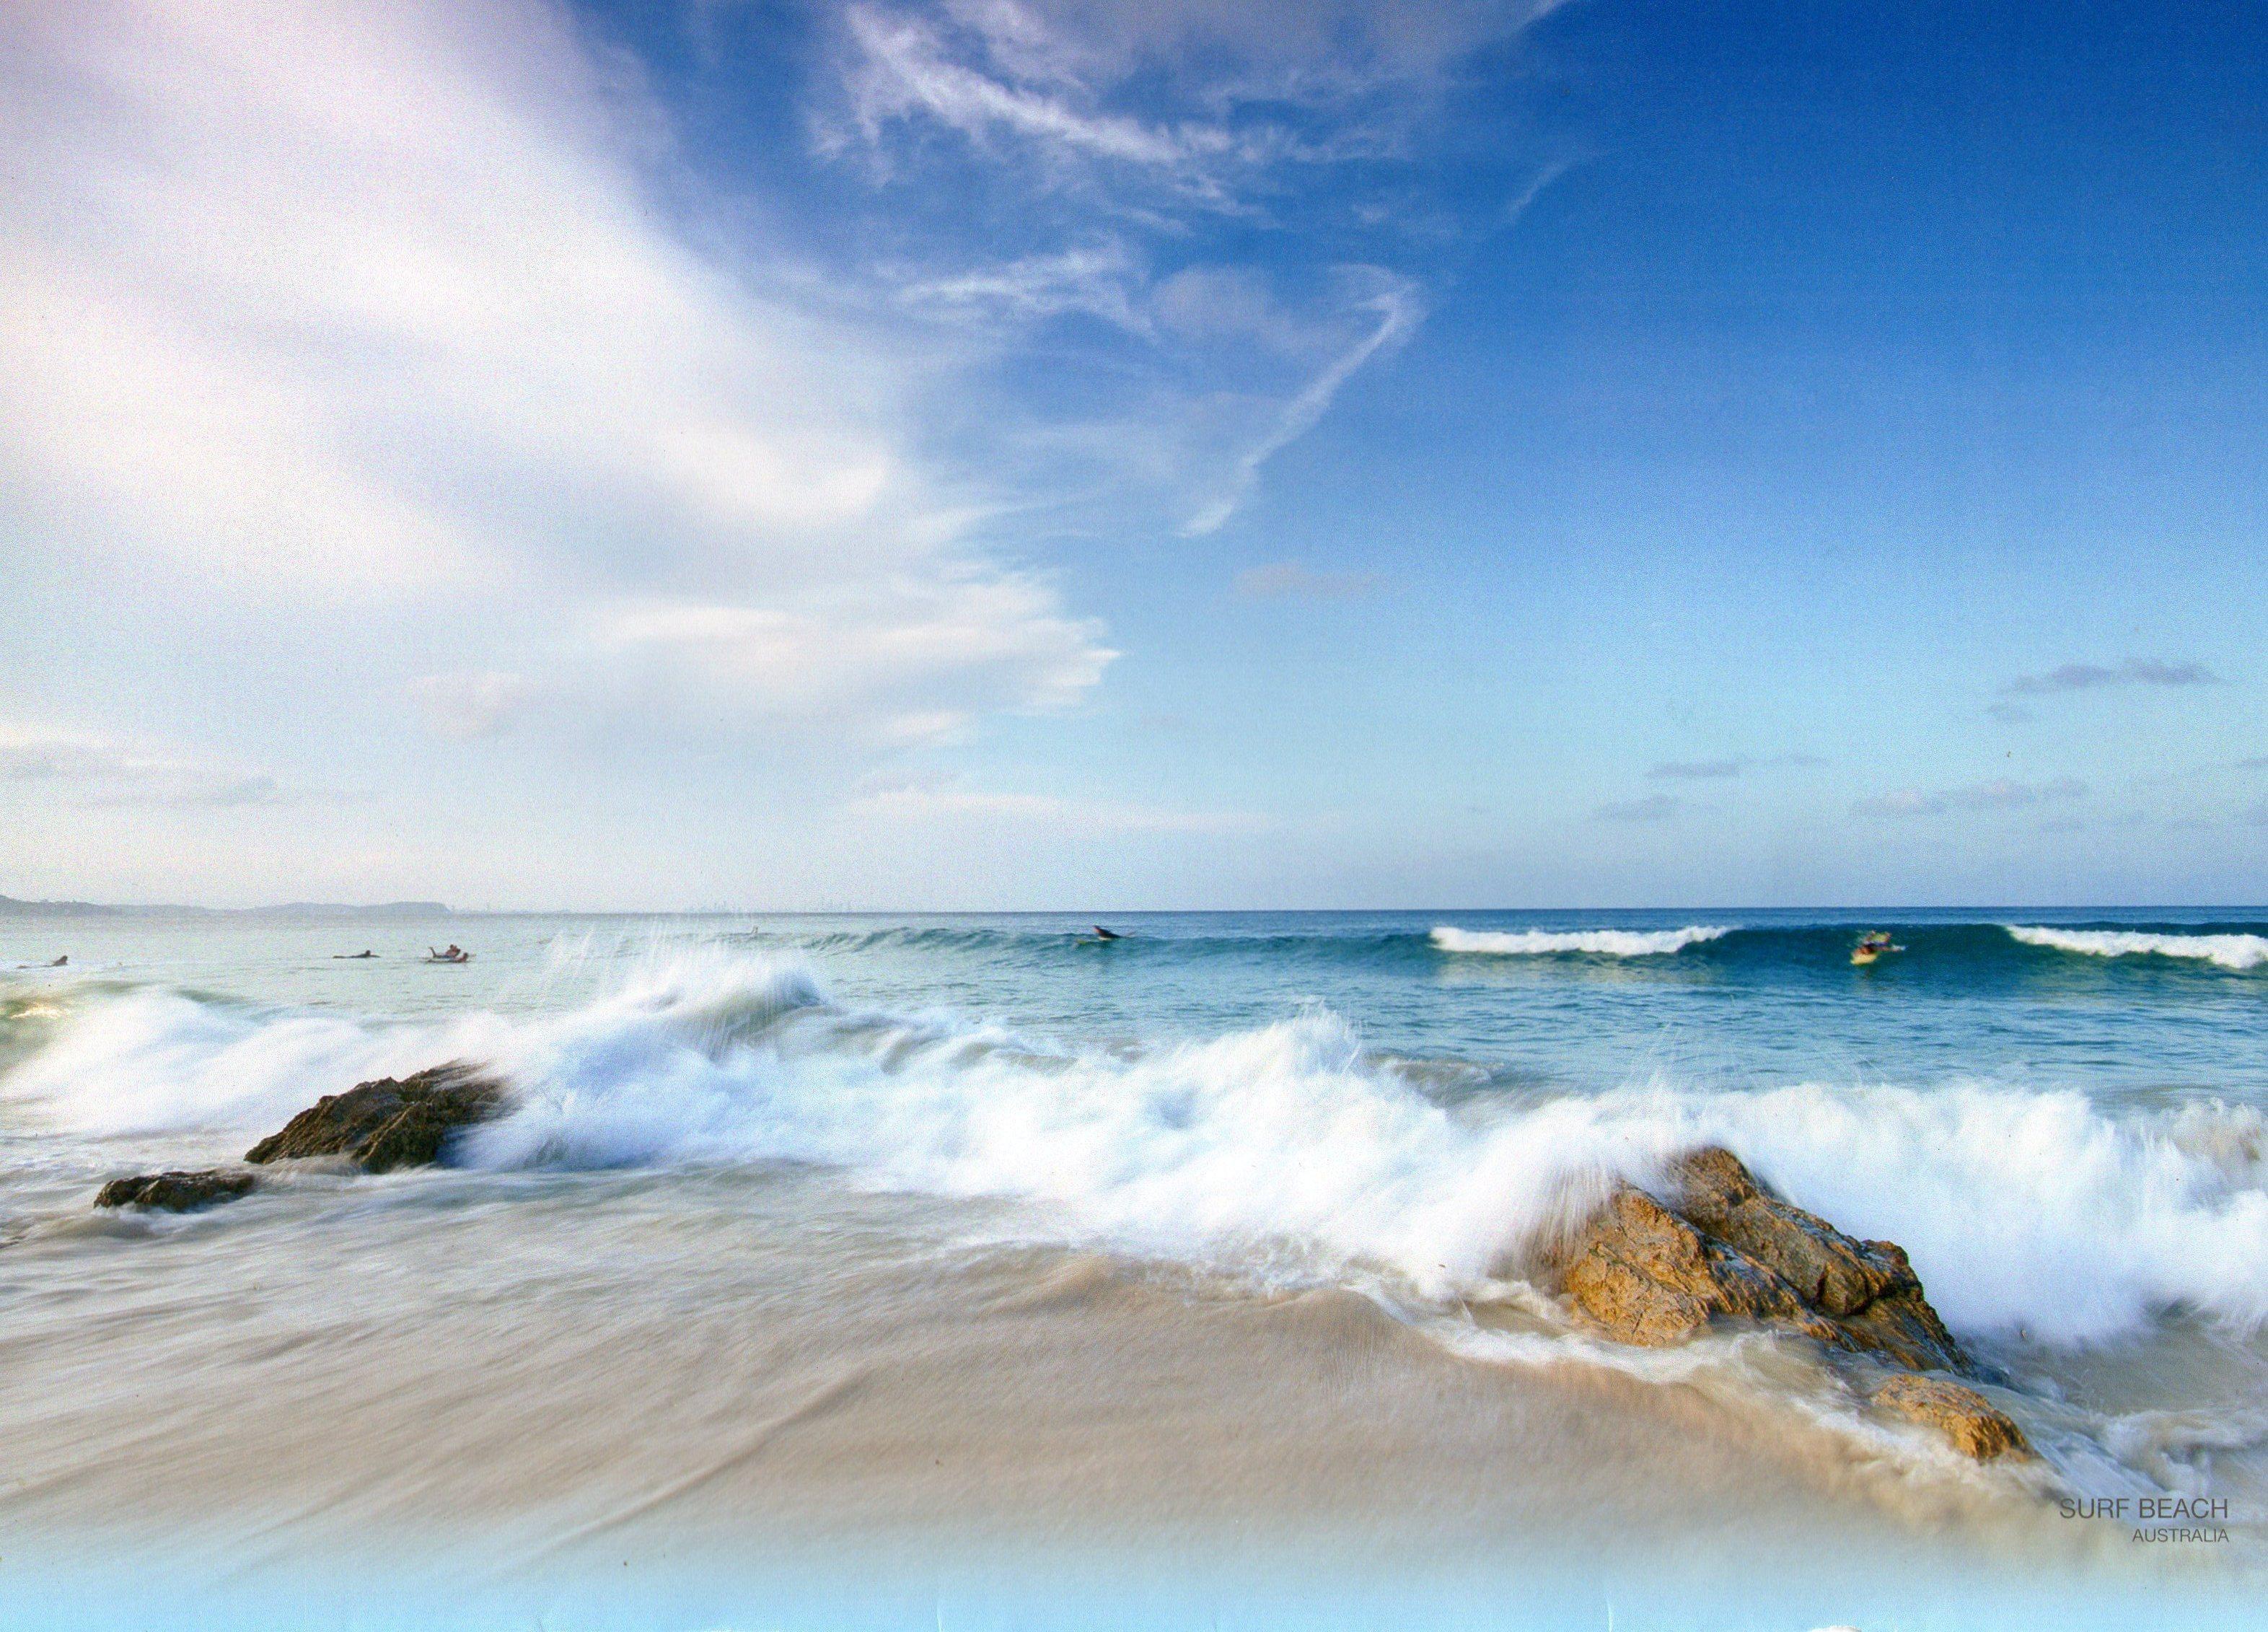 Anime Girl Thanksgiving Wallpaper Surf Beach Images Free Download Pixelstalk Net